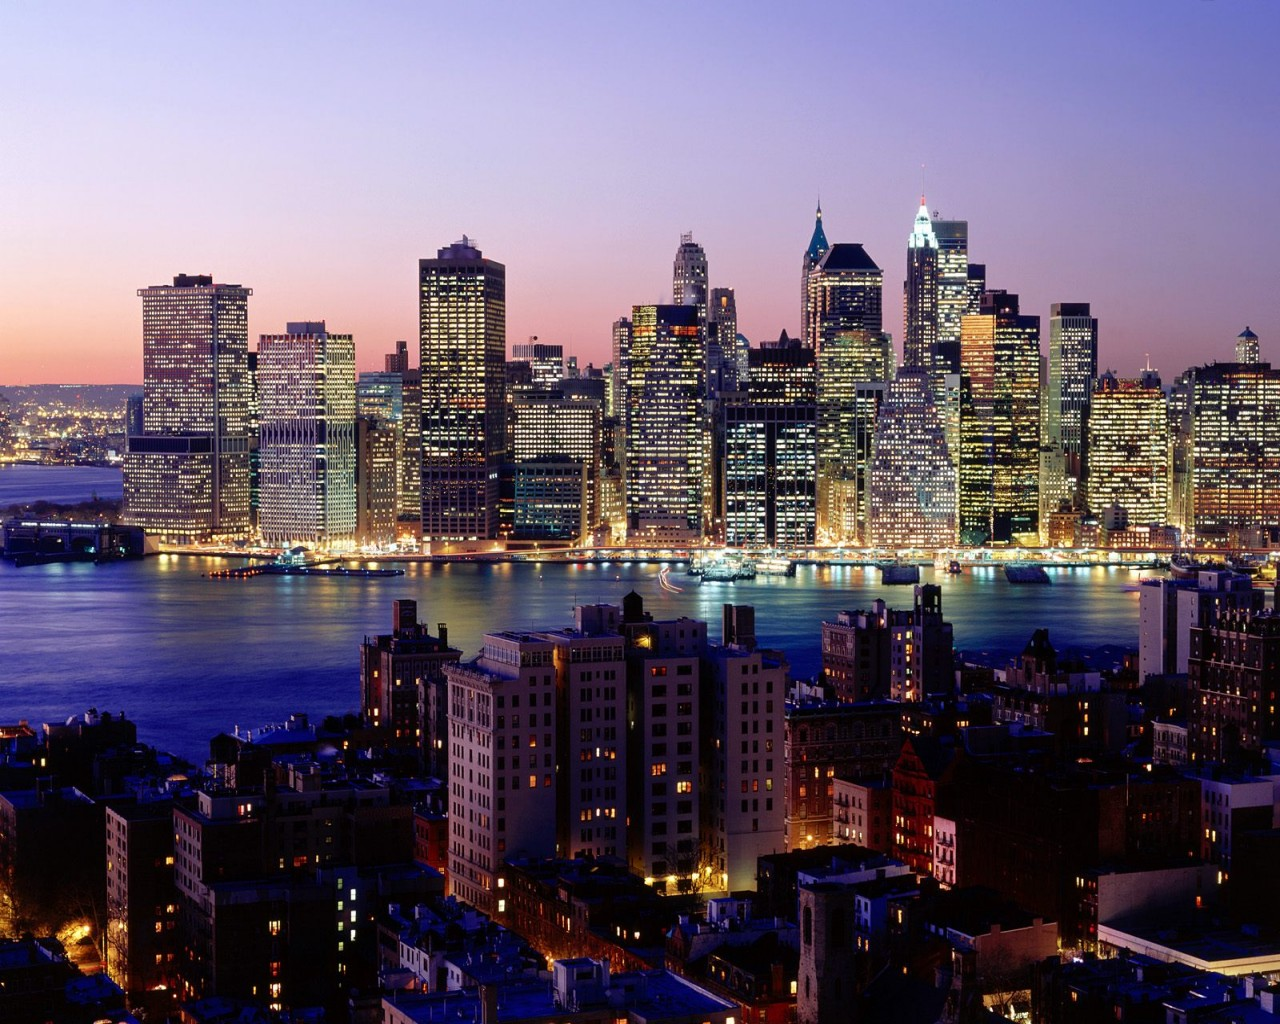 Hong Kong Iphone X Wallpaper Twilight Sky New York Wallpapers Hd Wallpapers Id 886